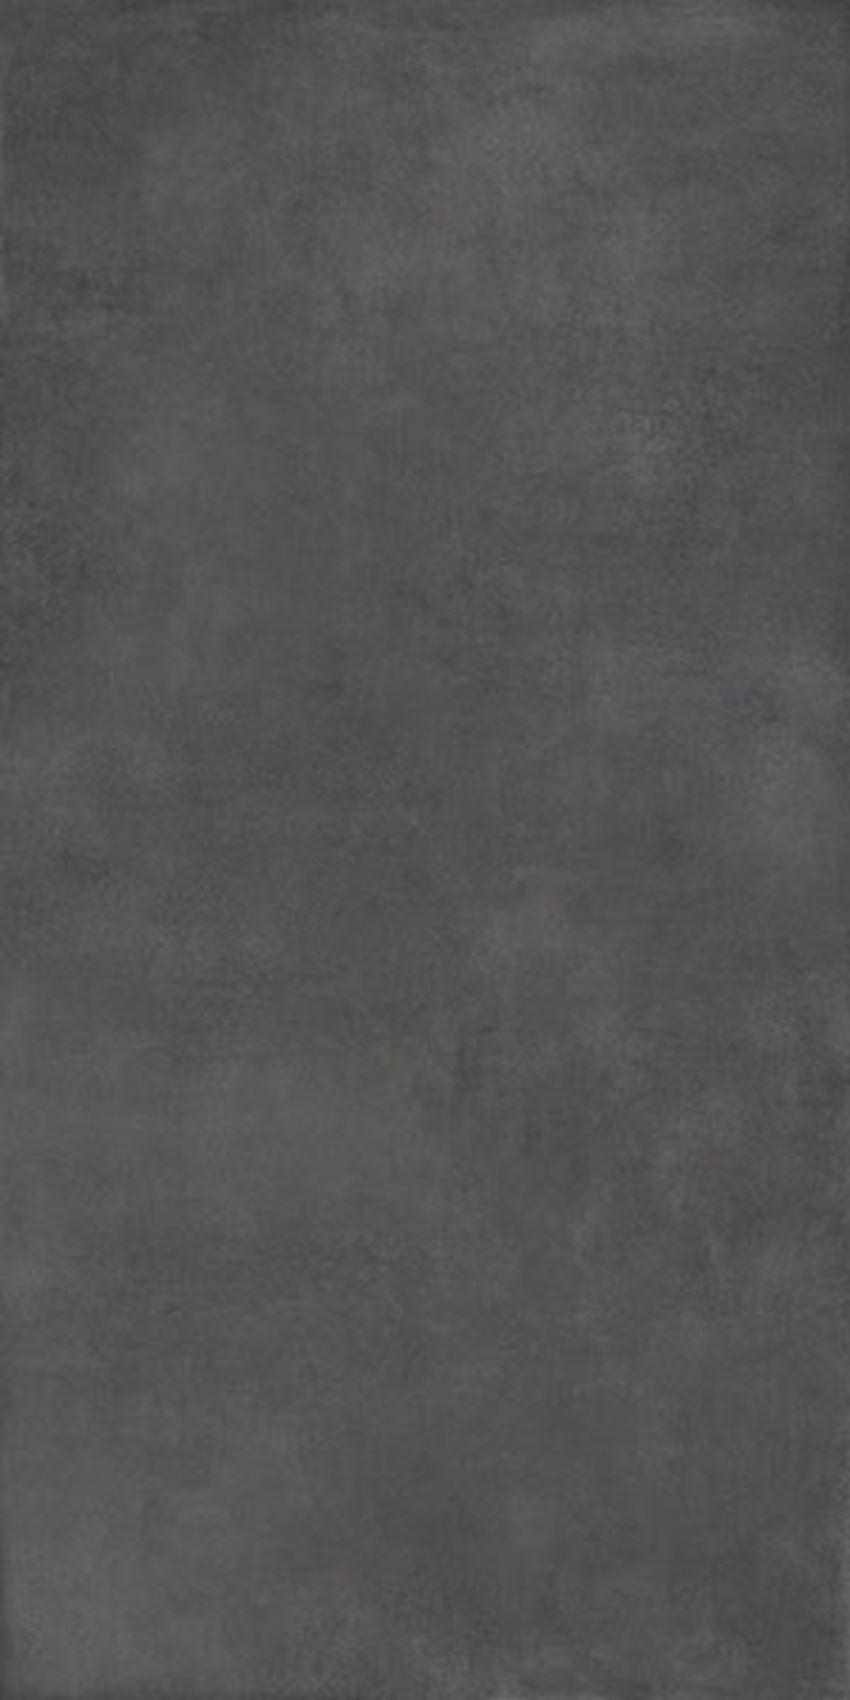 Płytka ścienna 162x324 cm Cerrad Concrete anthracite